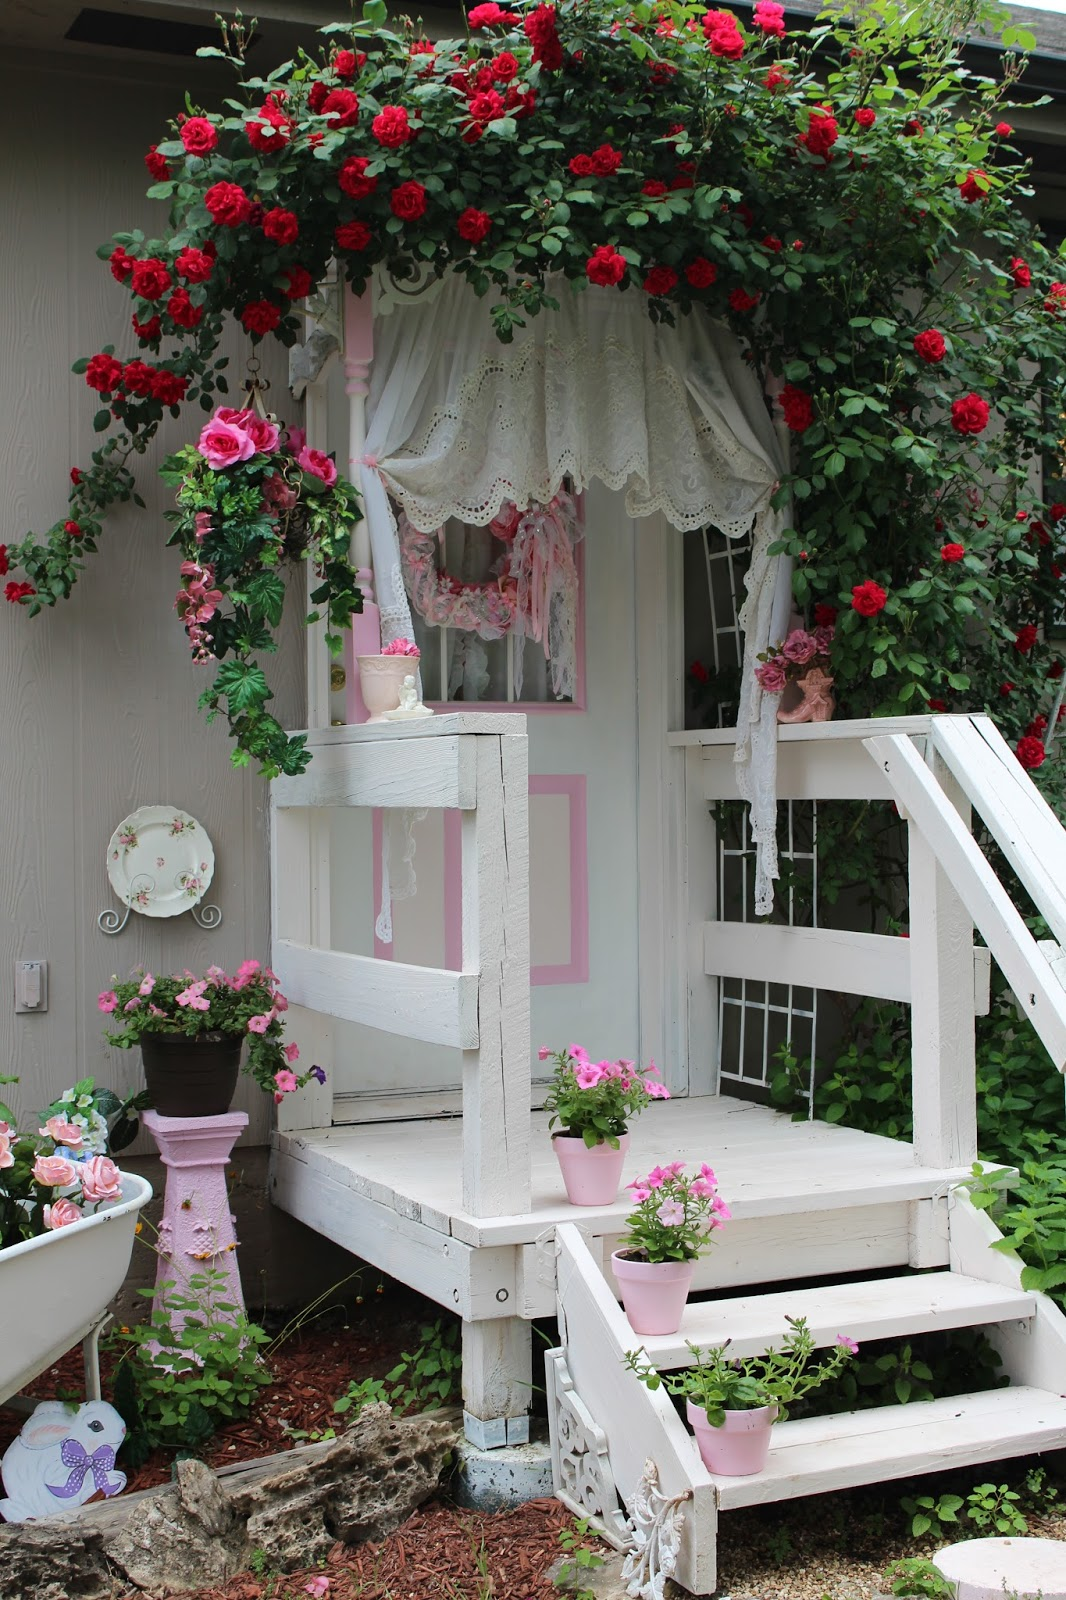 Olivia's Romantic Home: Shabby Chic Garden